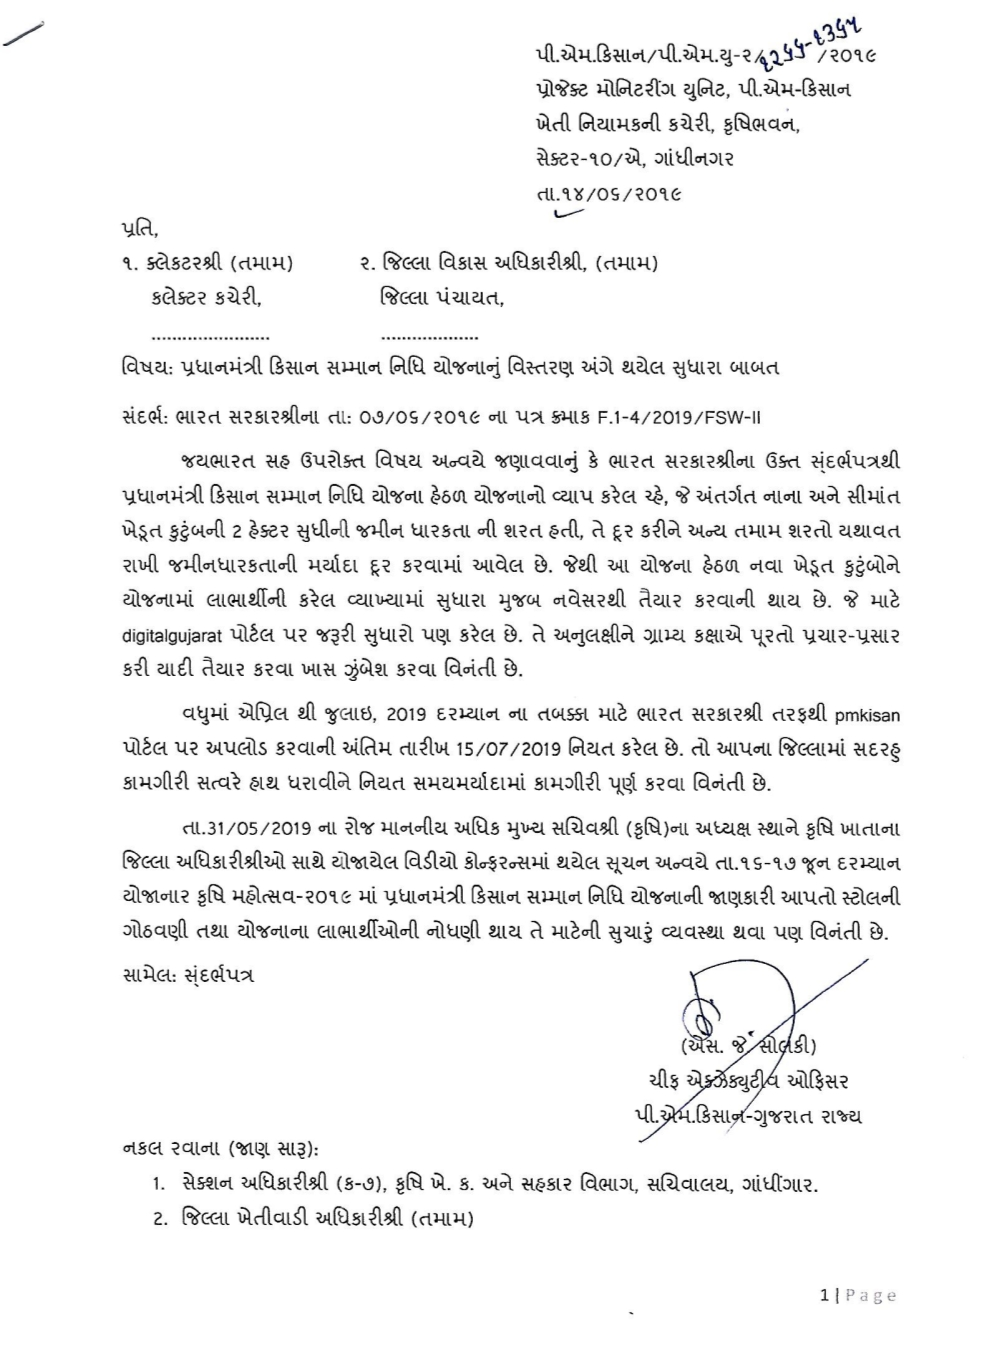 Digital Gujarat PM Kisan